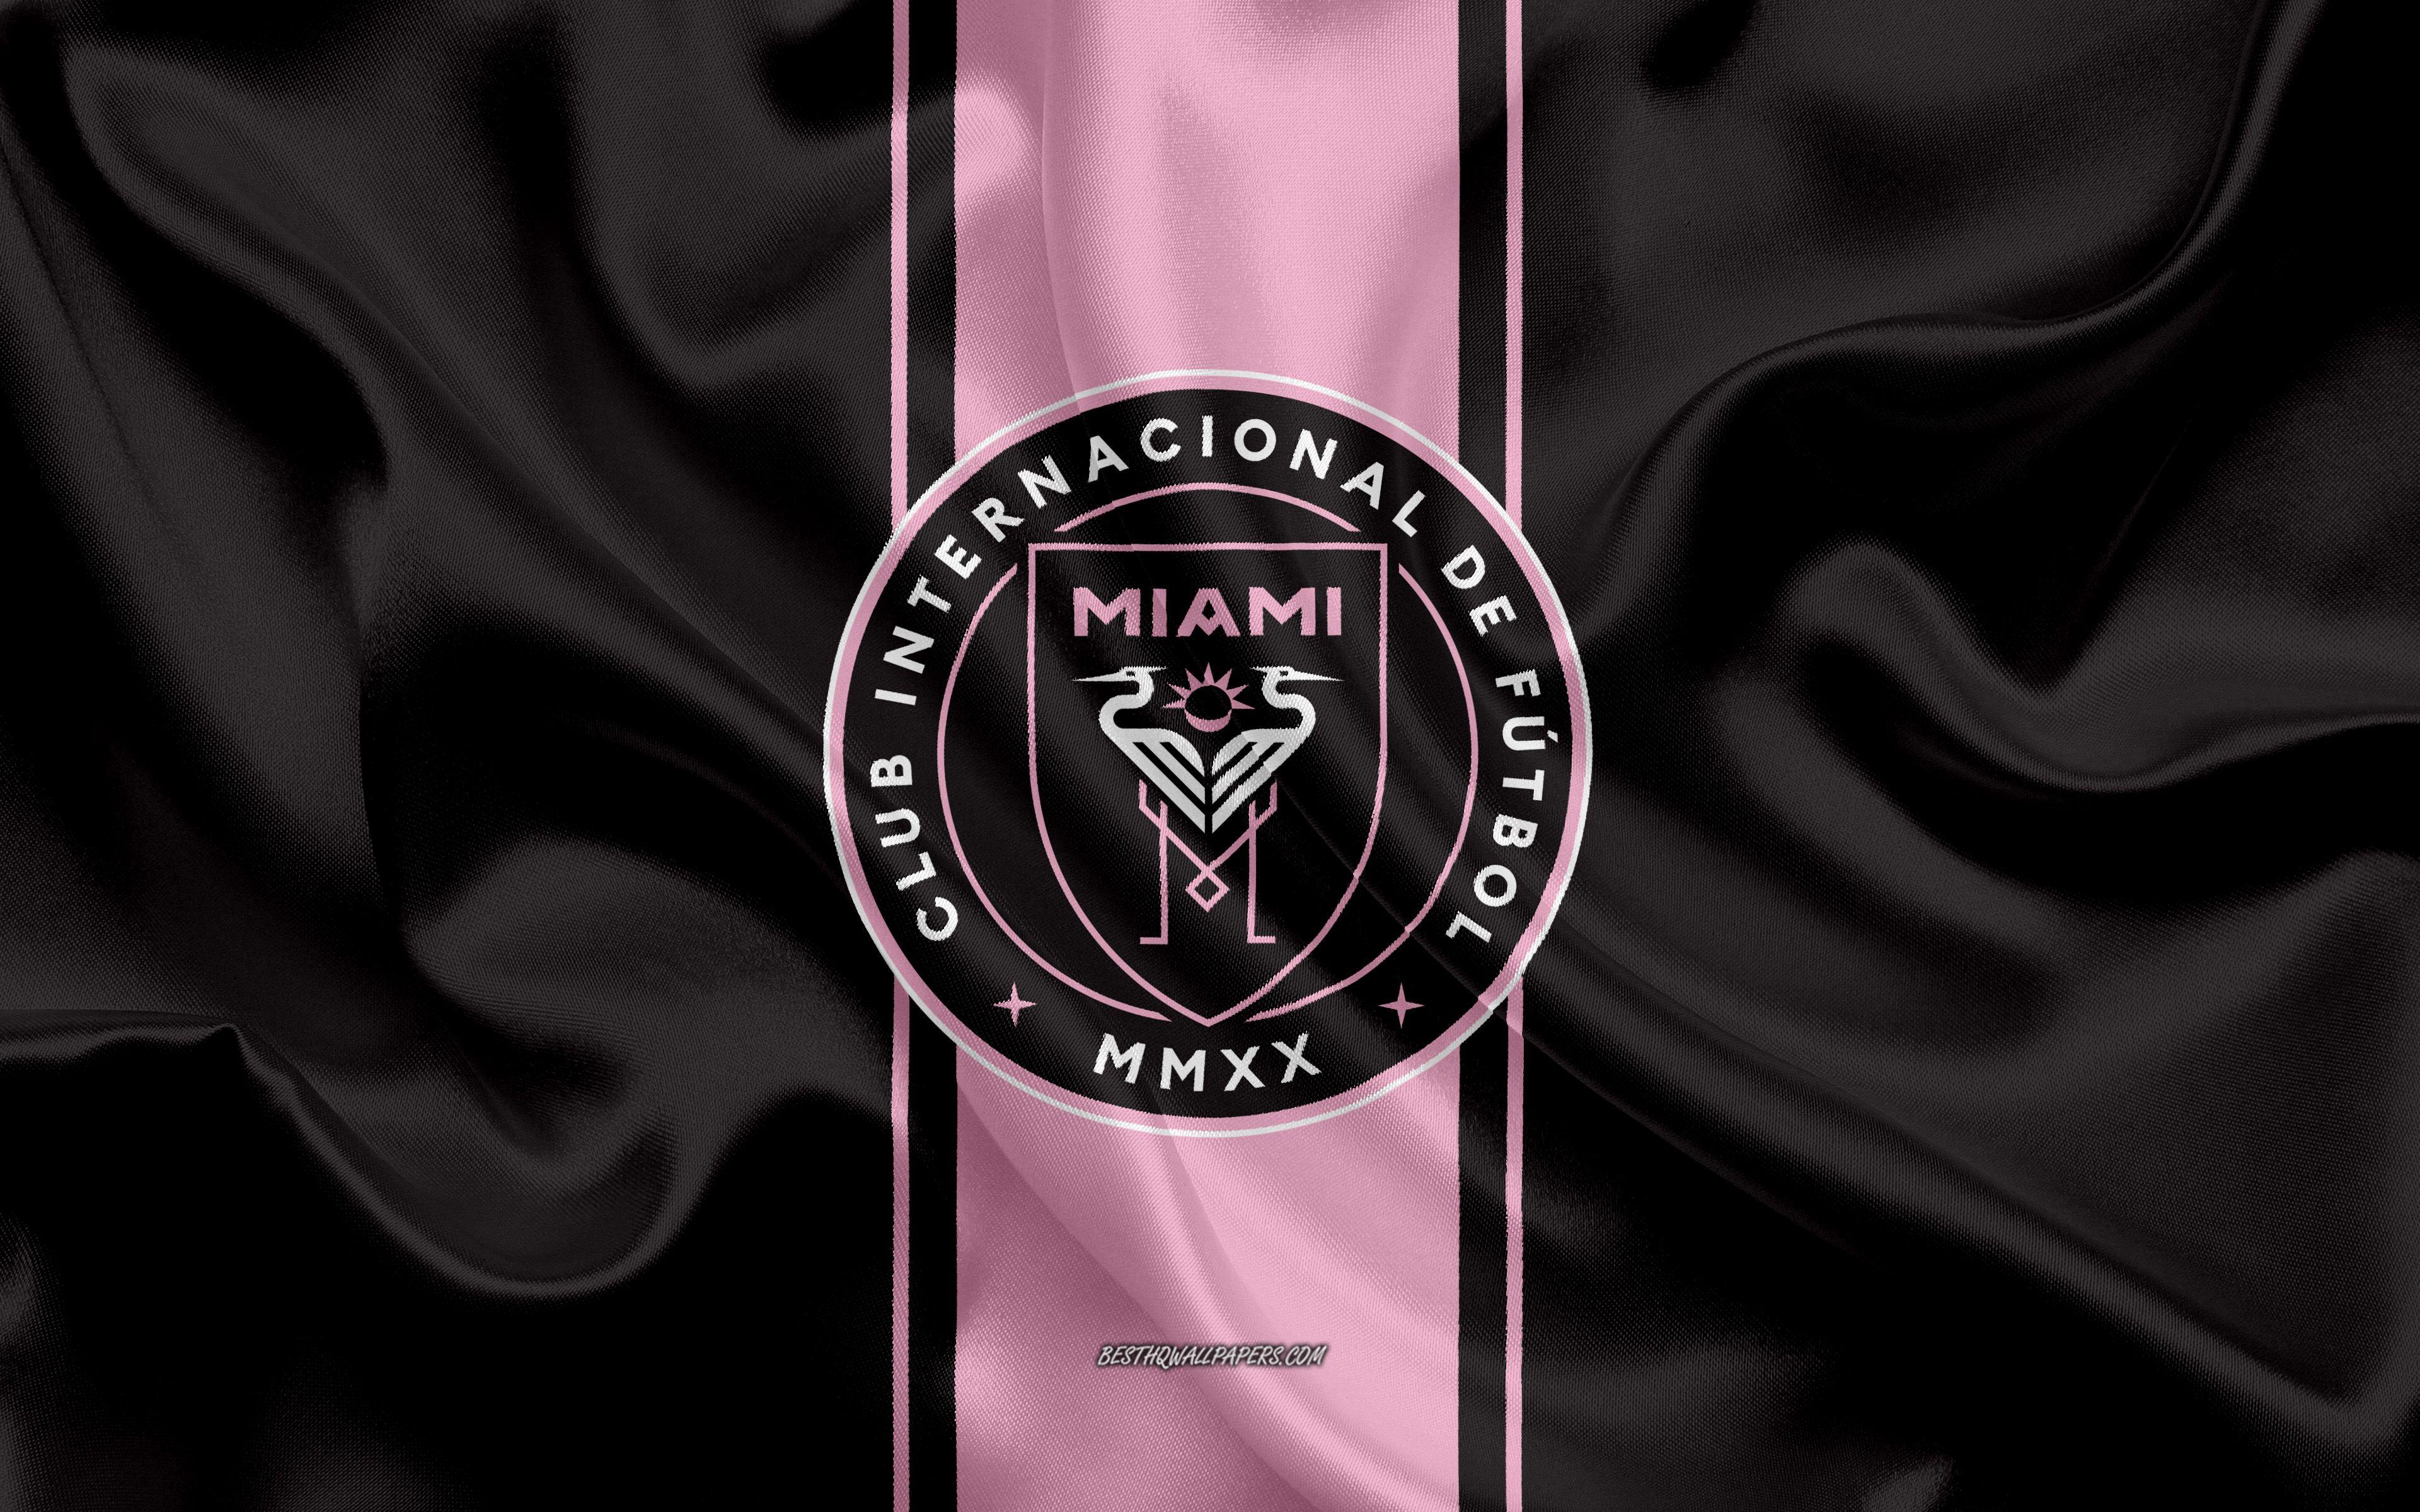 Inter Miami Wallpapers Wallpaper Cave